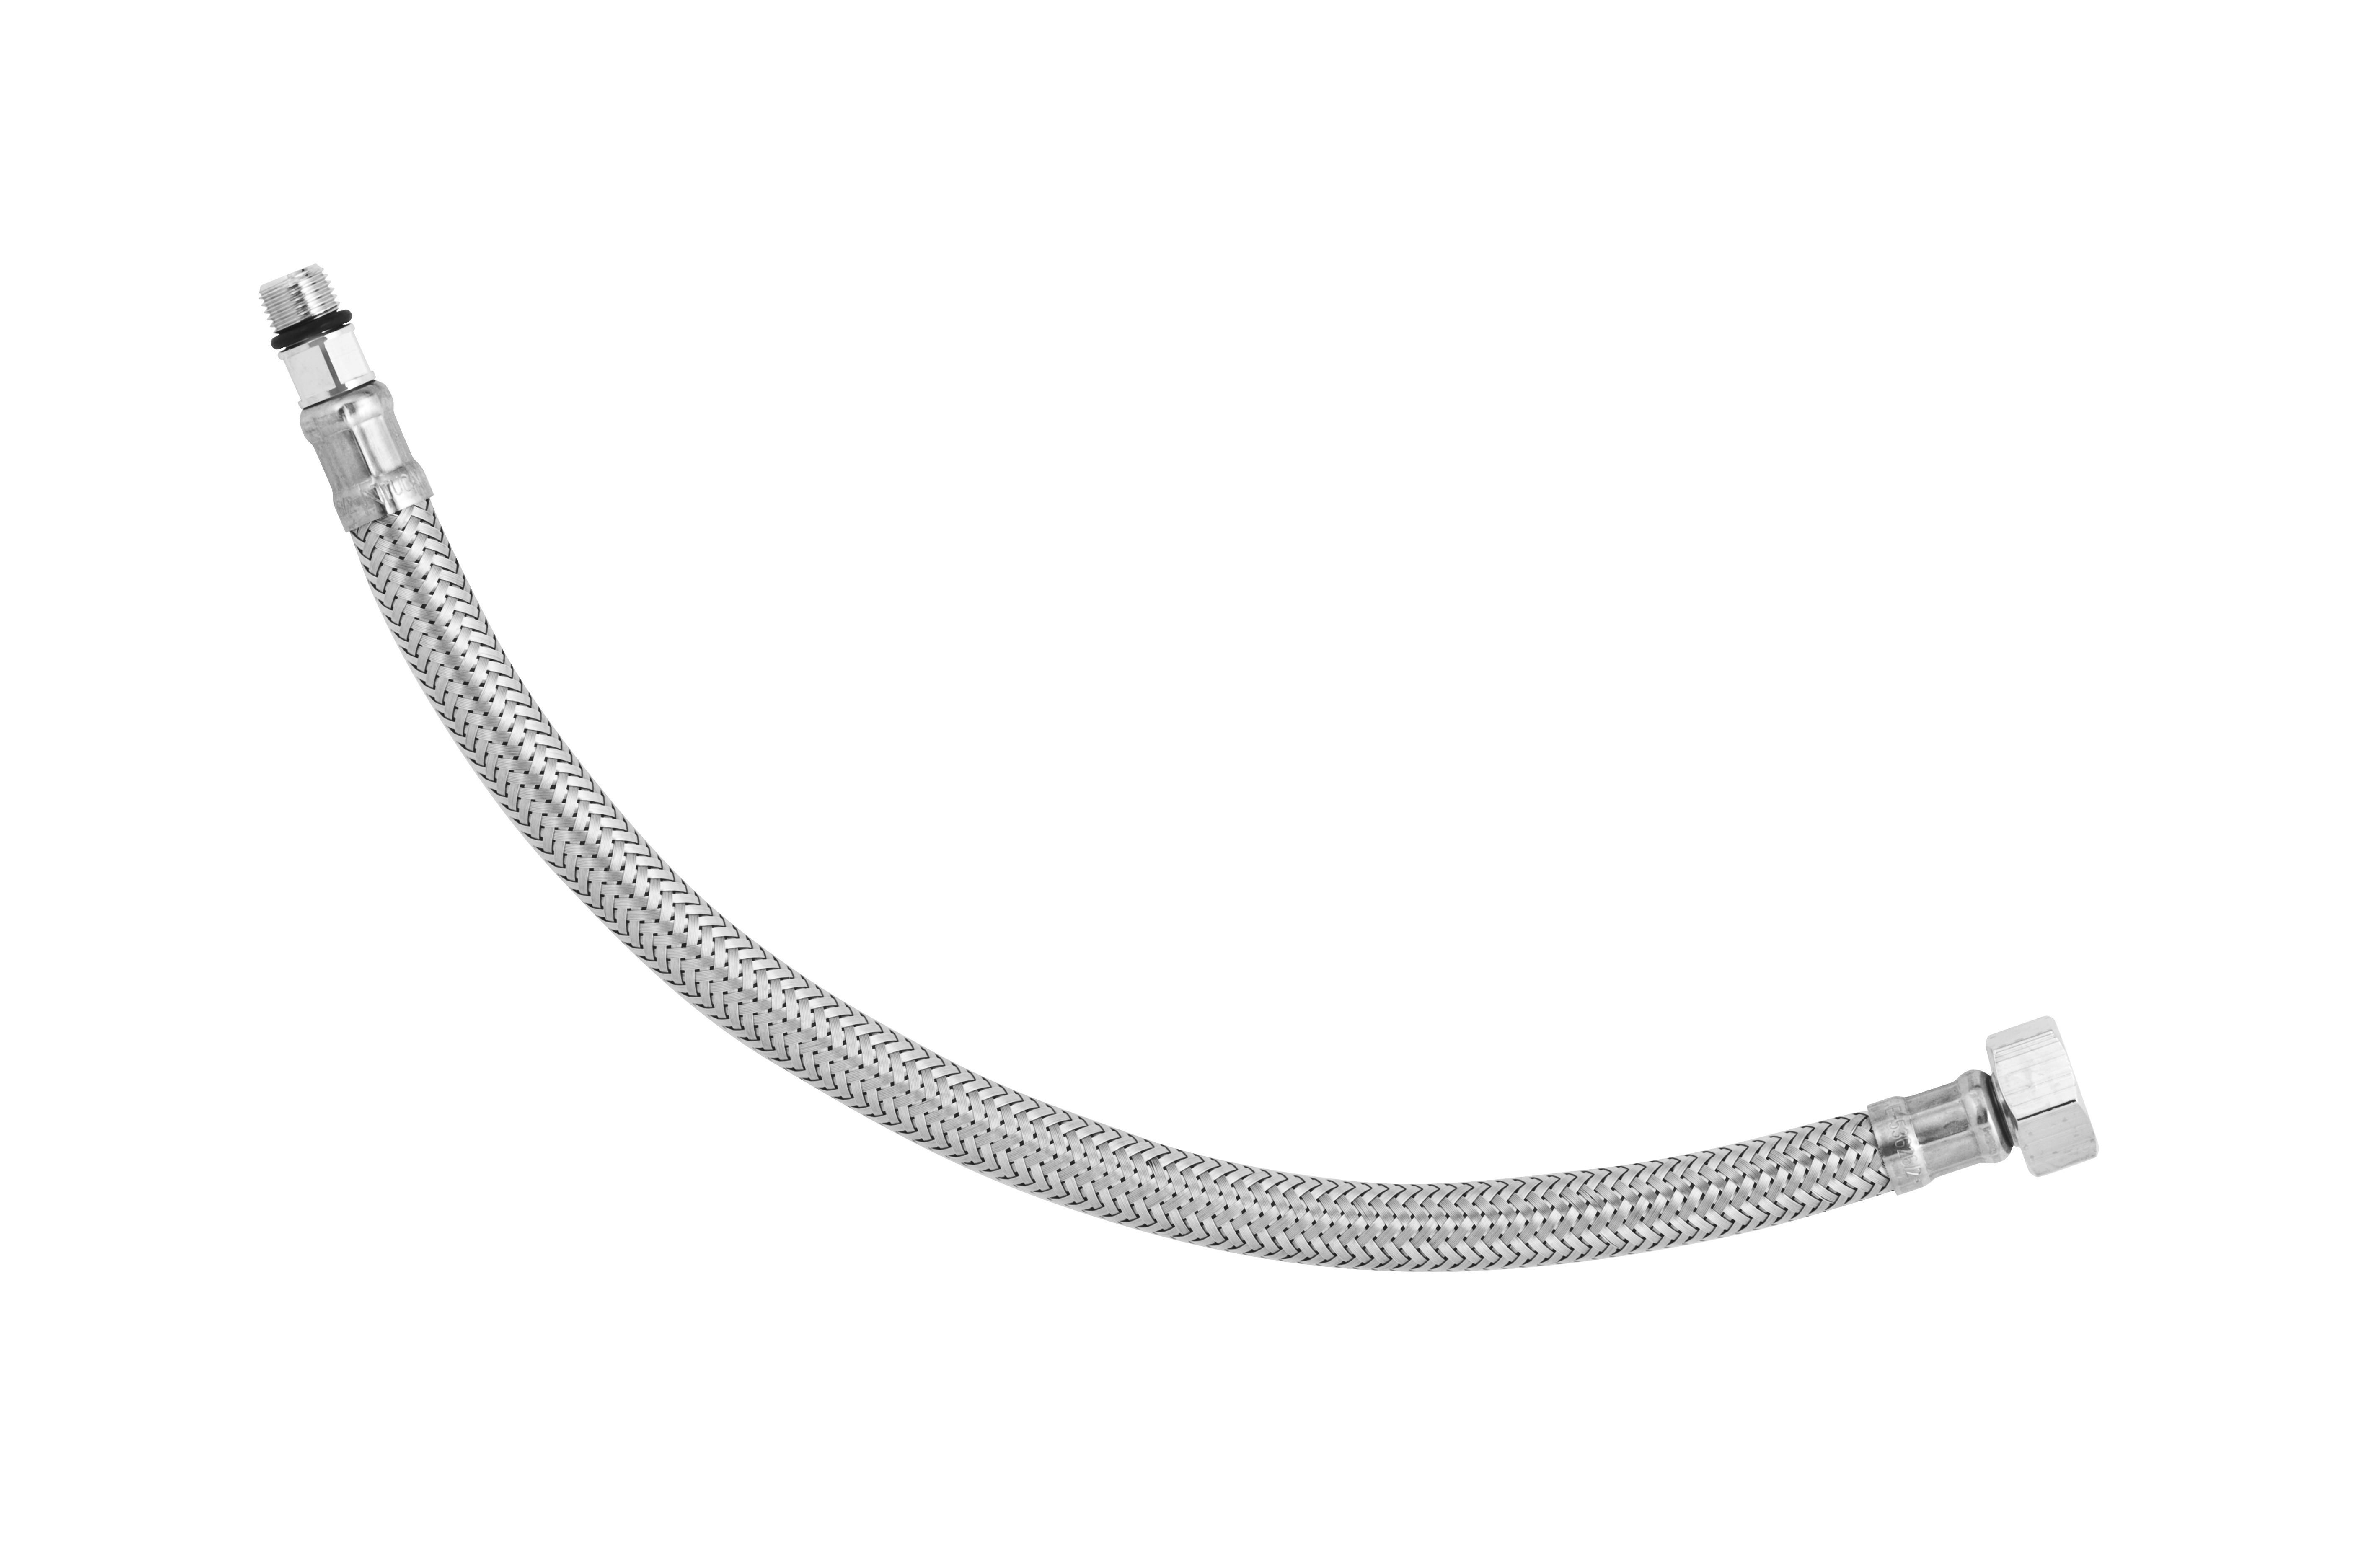 Racord flexibil pentru apa TAQ GRIF